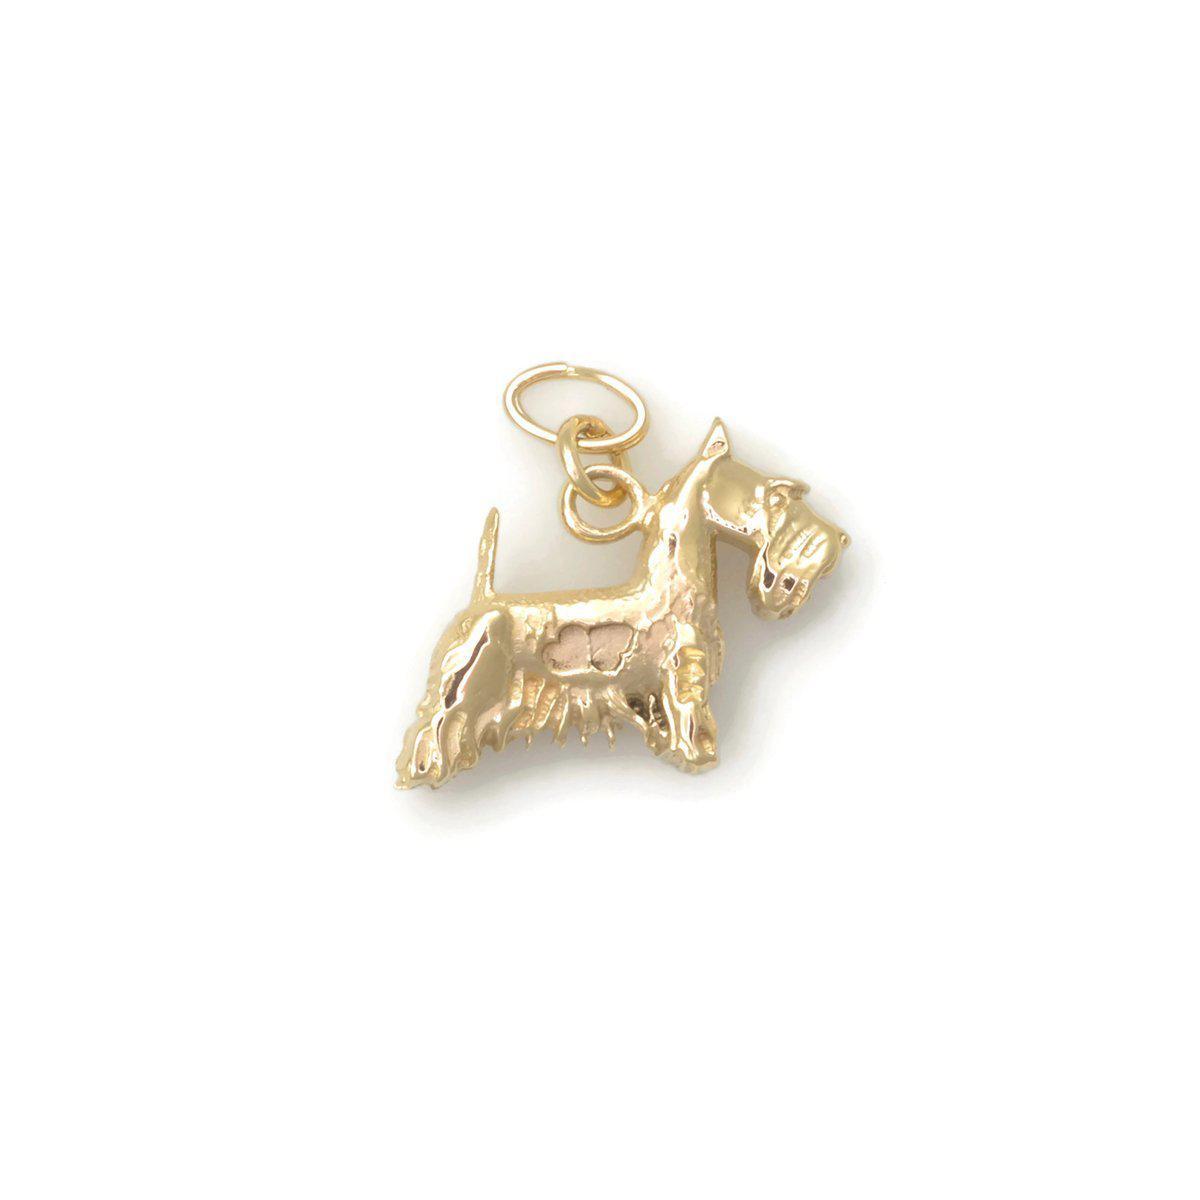 Donna Pizarro Designs 14kt Yellow Gold Scottish Terrier Charm Q3BeTPw